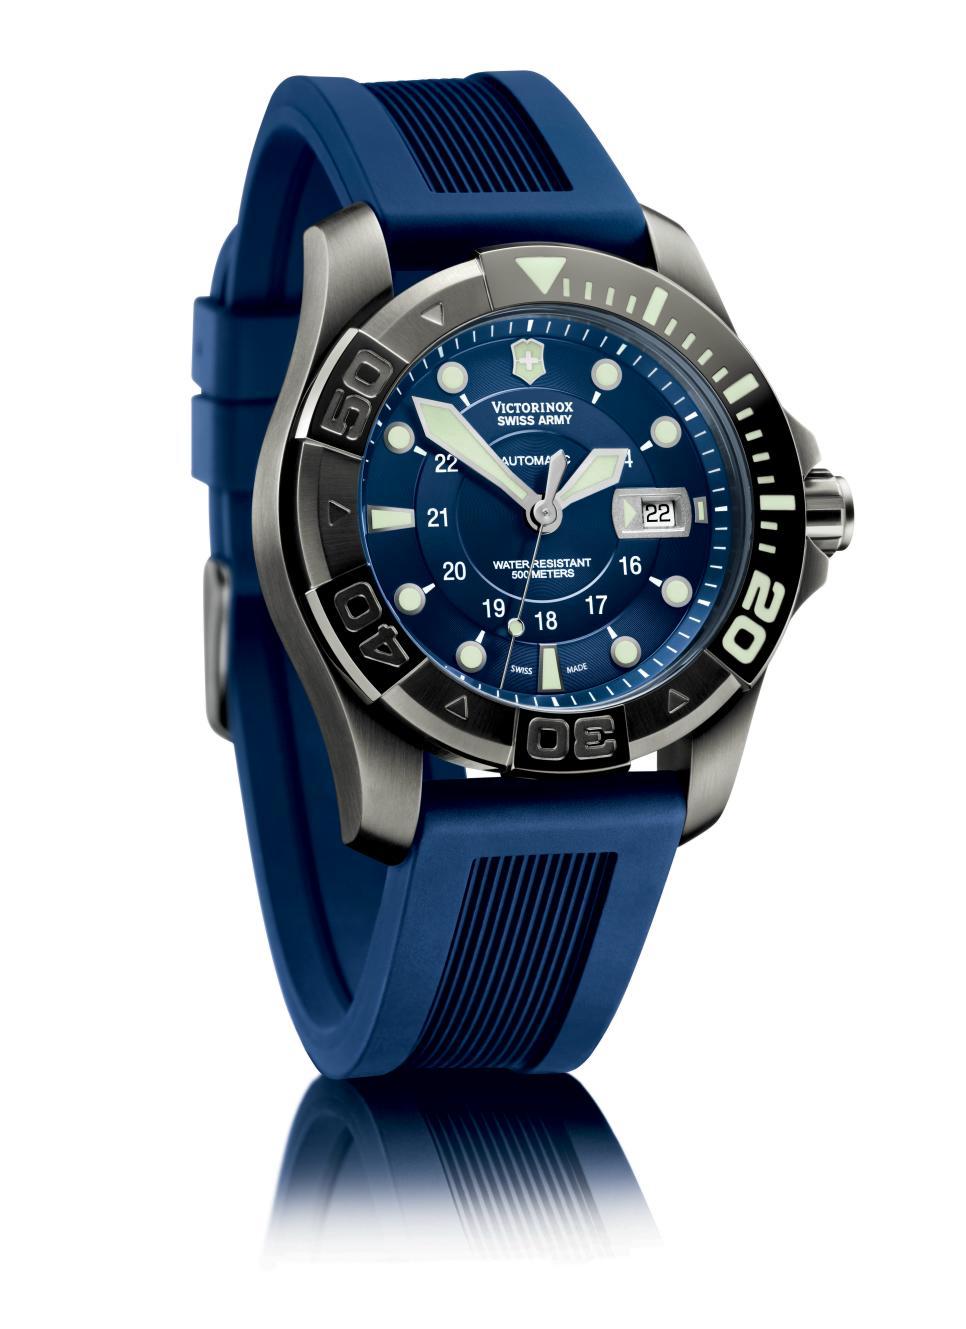 News : Victorinox Dive Master 500 PVD Blue Ice Bluevictor